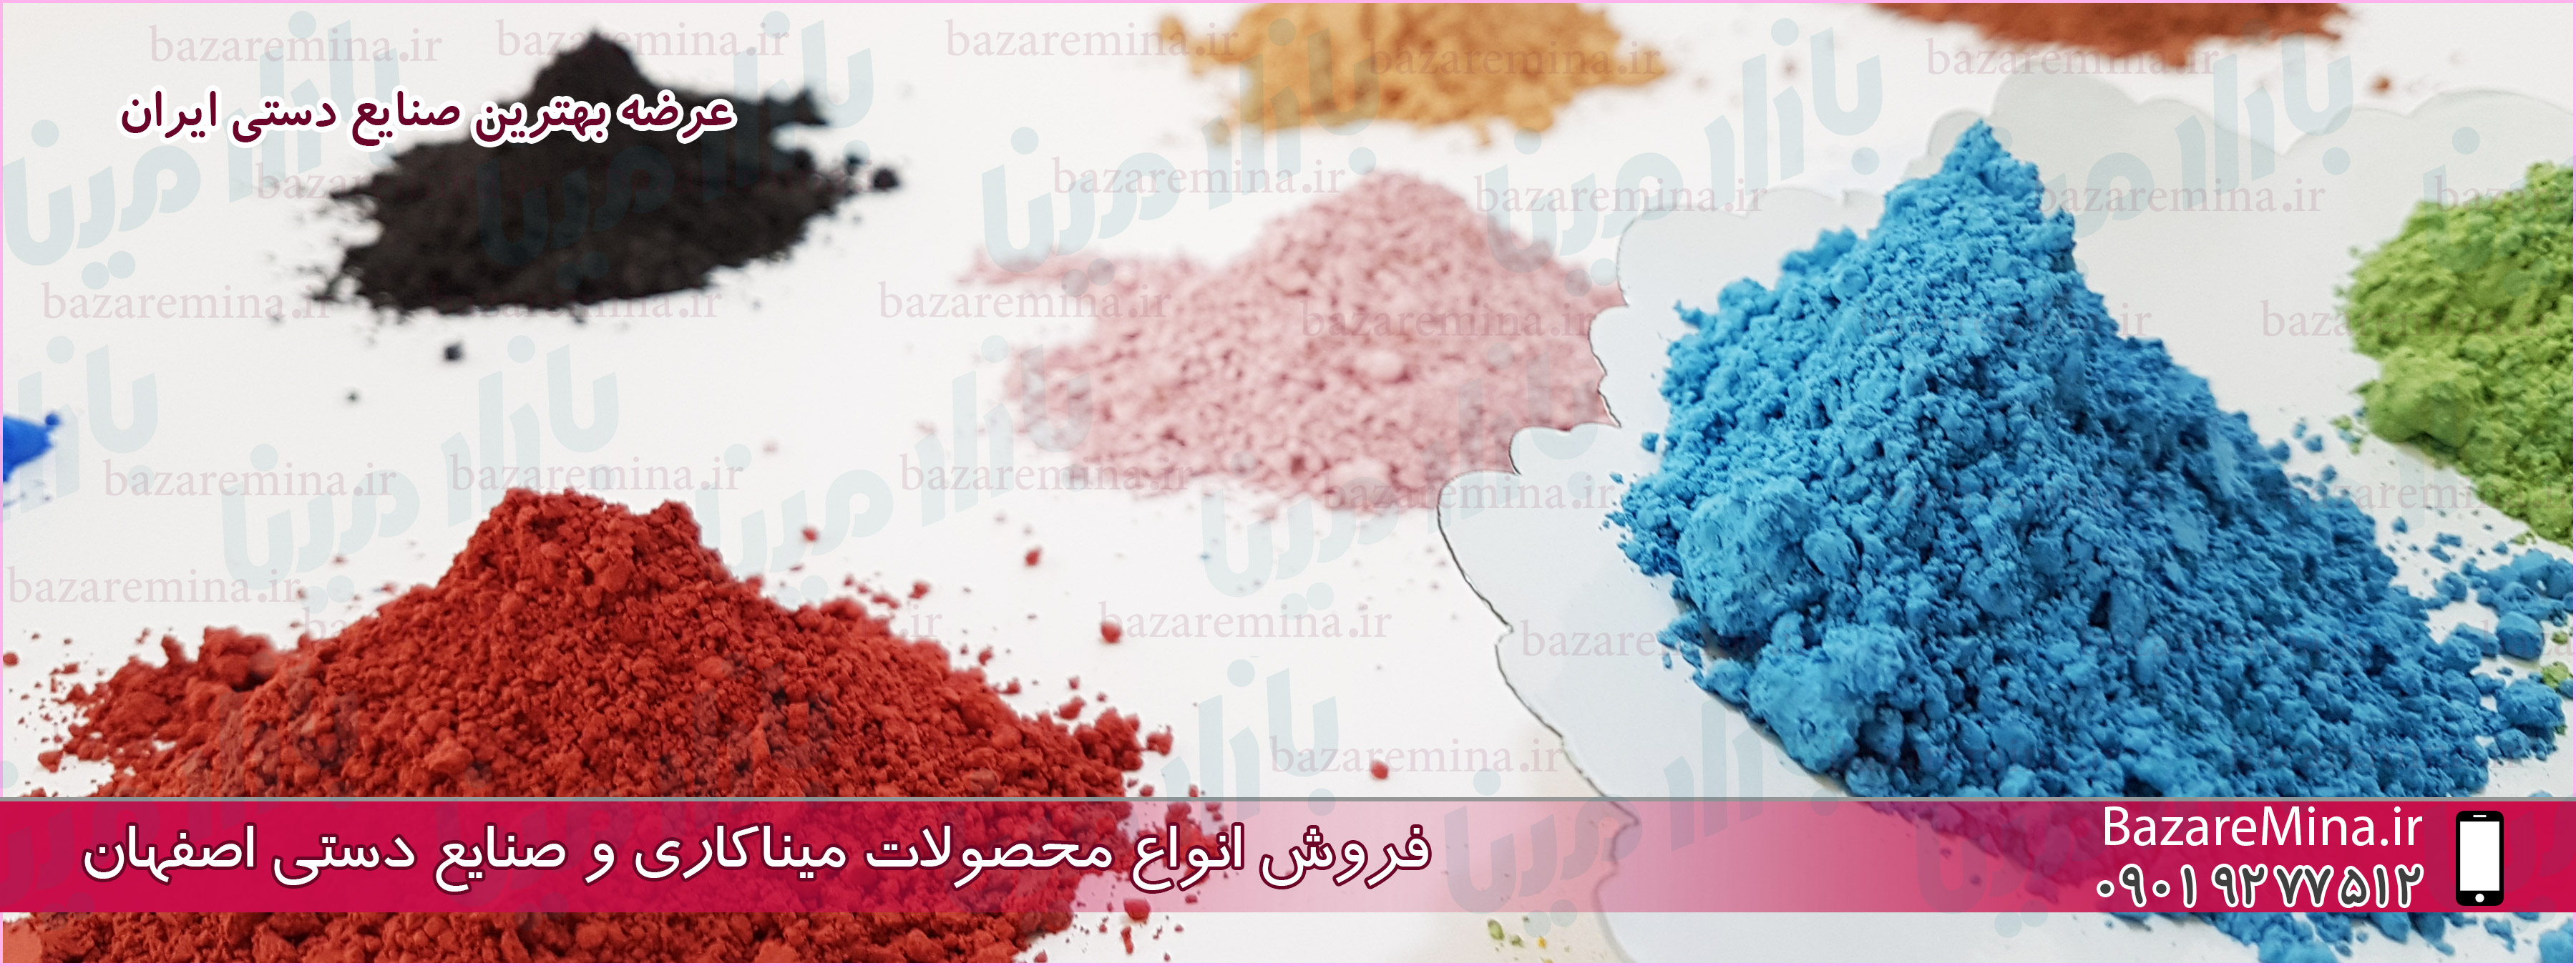 فروش رنگ میناکاری روی مس اصفهان